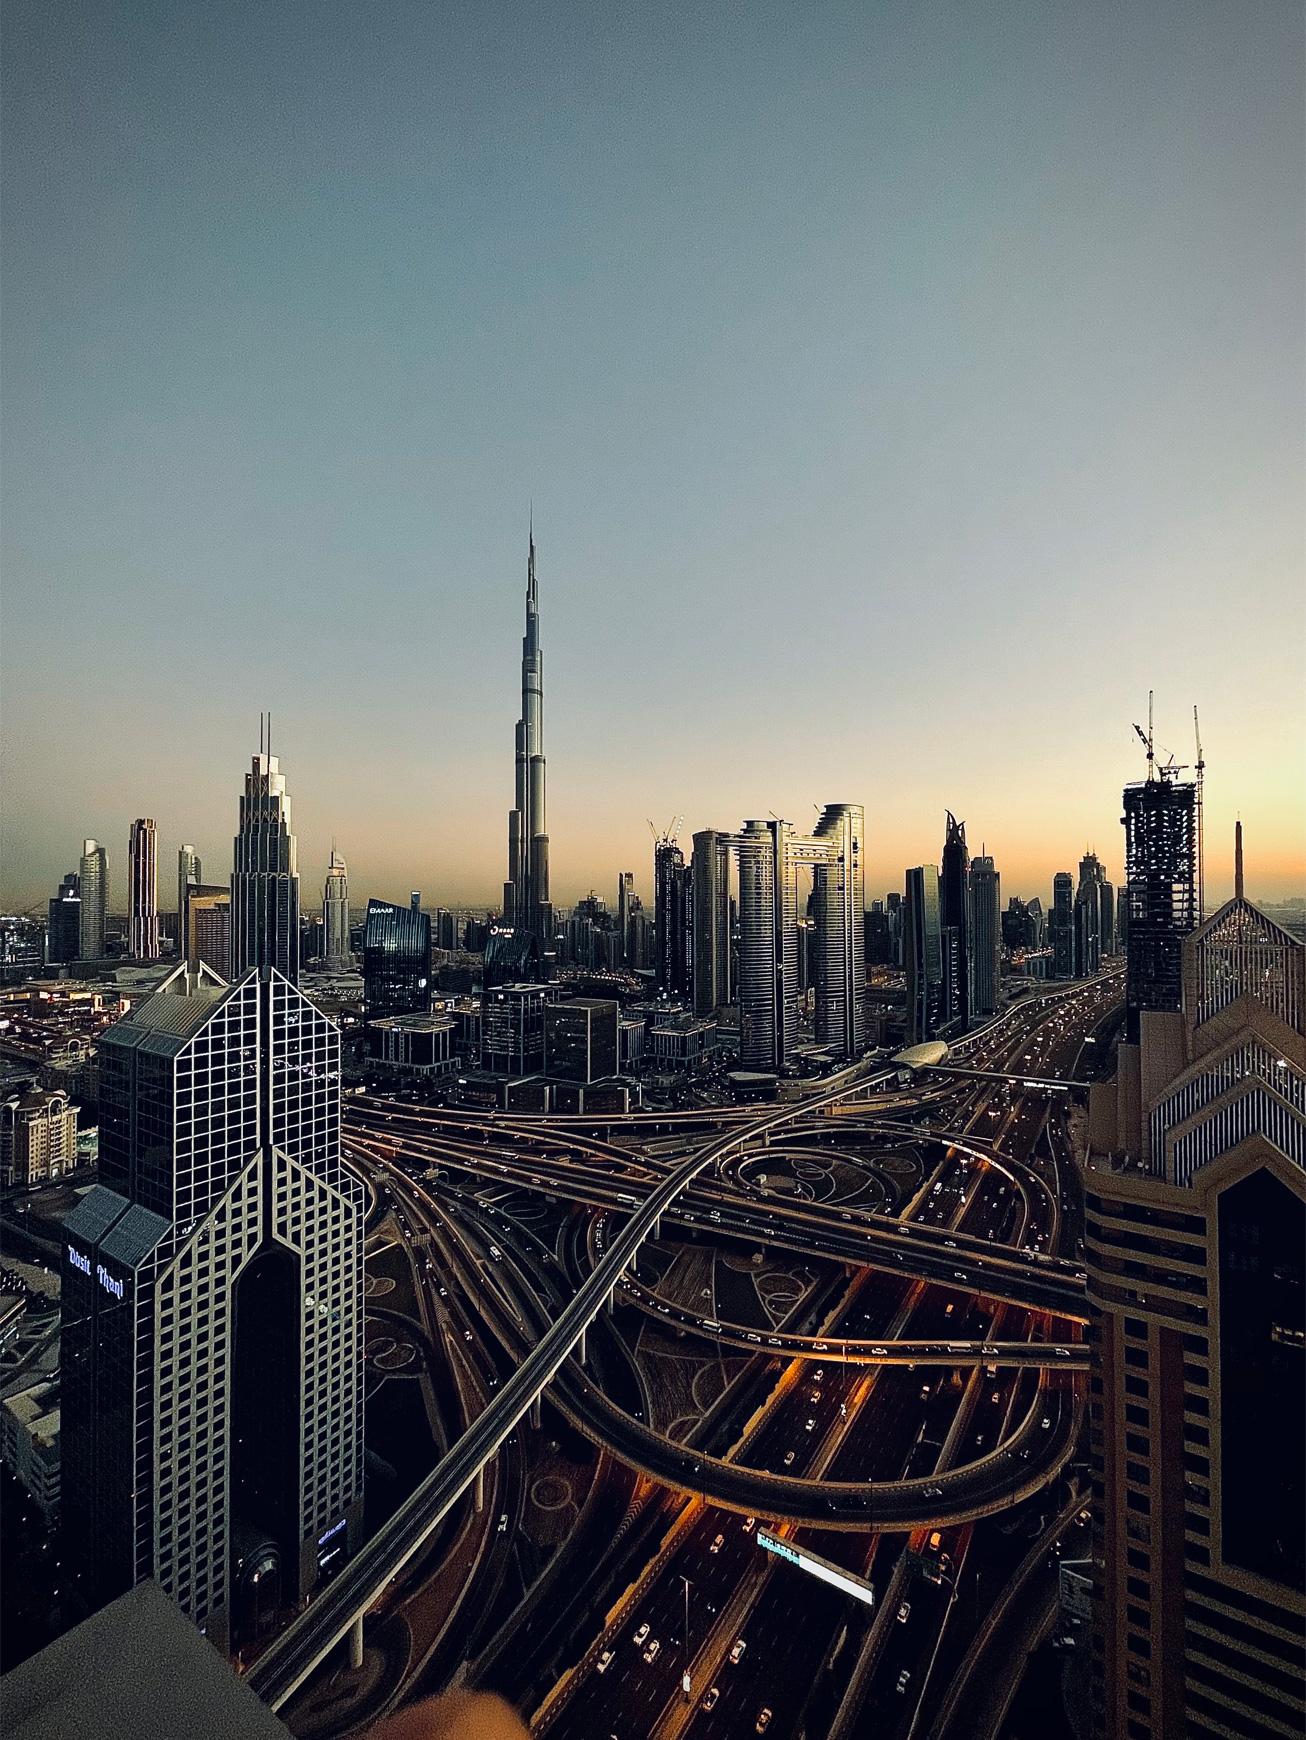 Apple_ShotoniPhone_abdullah_shaijie-middle-east_011221